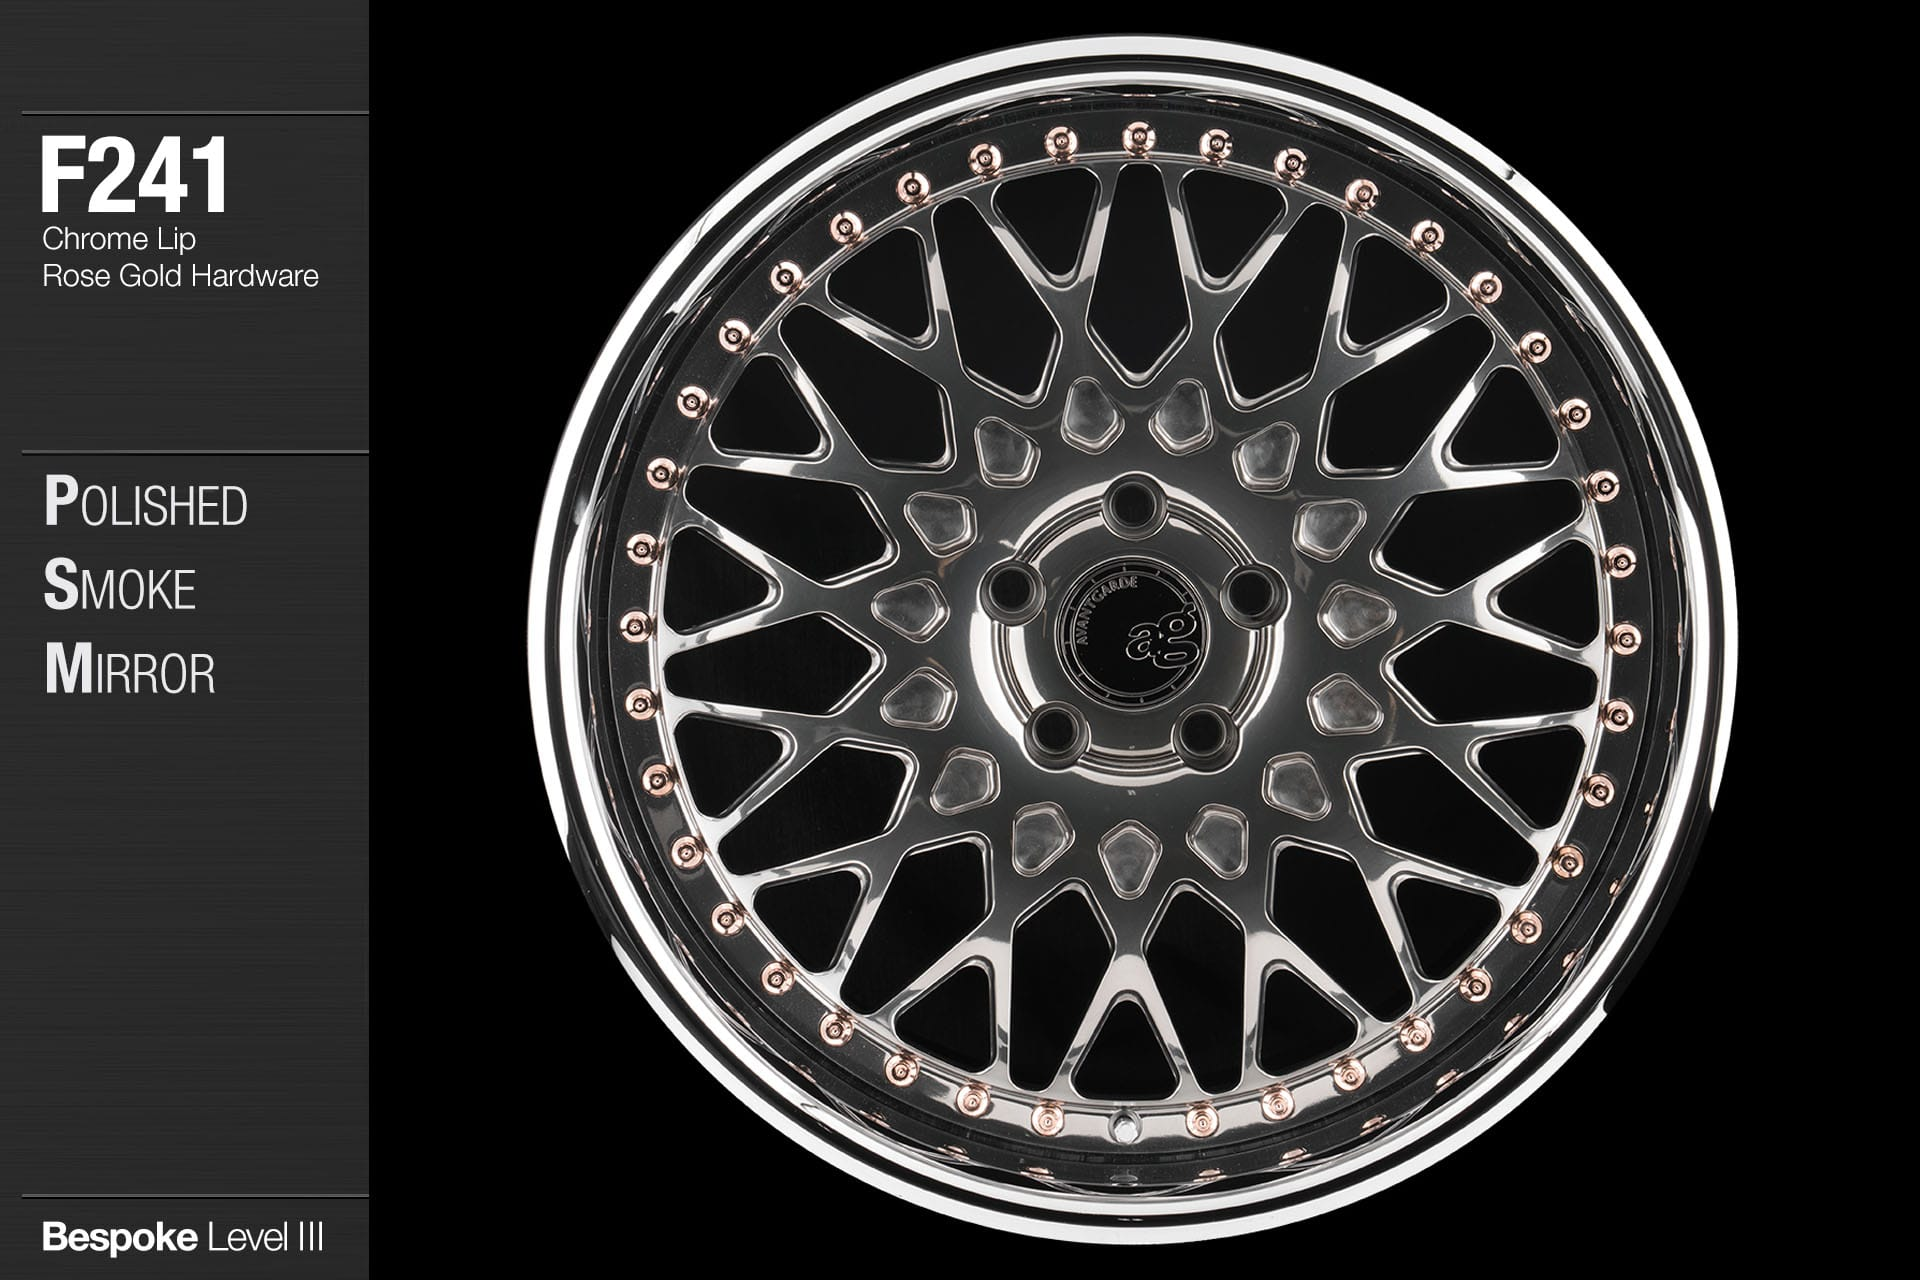 avant-garde-ag-wheels-f241-polished-smoke-mirror-face-chrome-lip-rose-gold-hardware-1-min